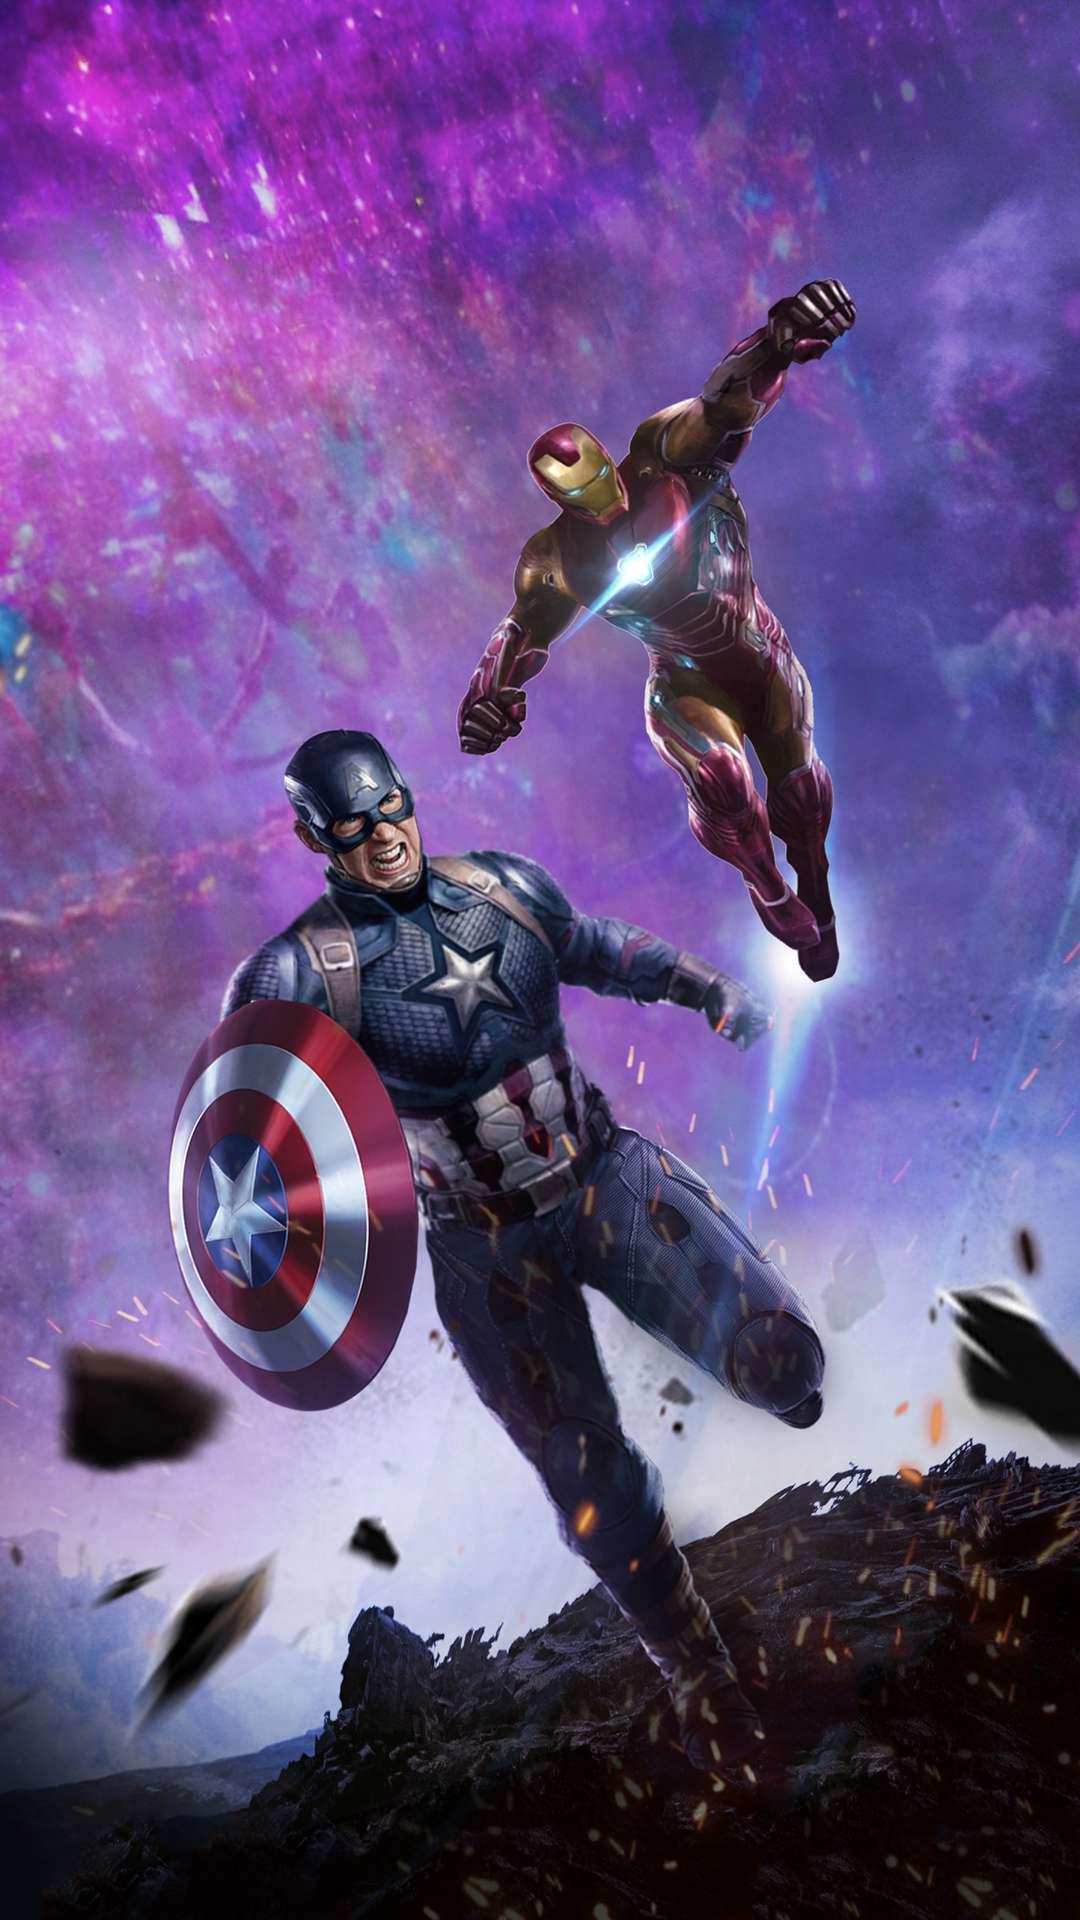 Iron Man and Captain America Endgame Battle iPhone Wallpaper